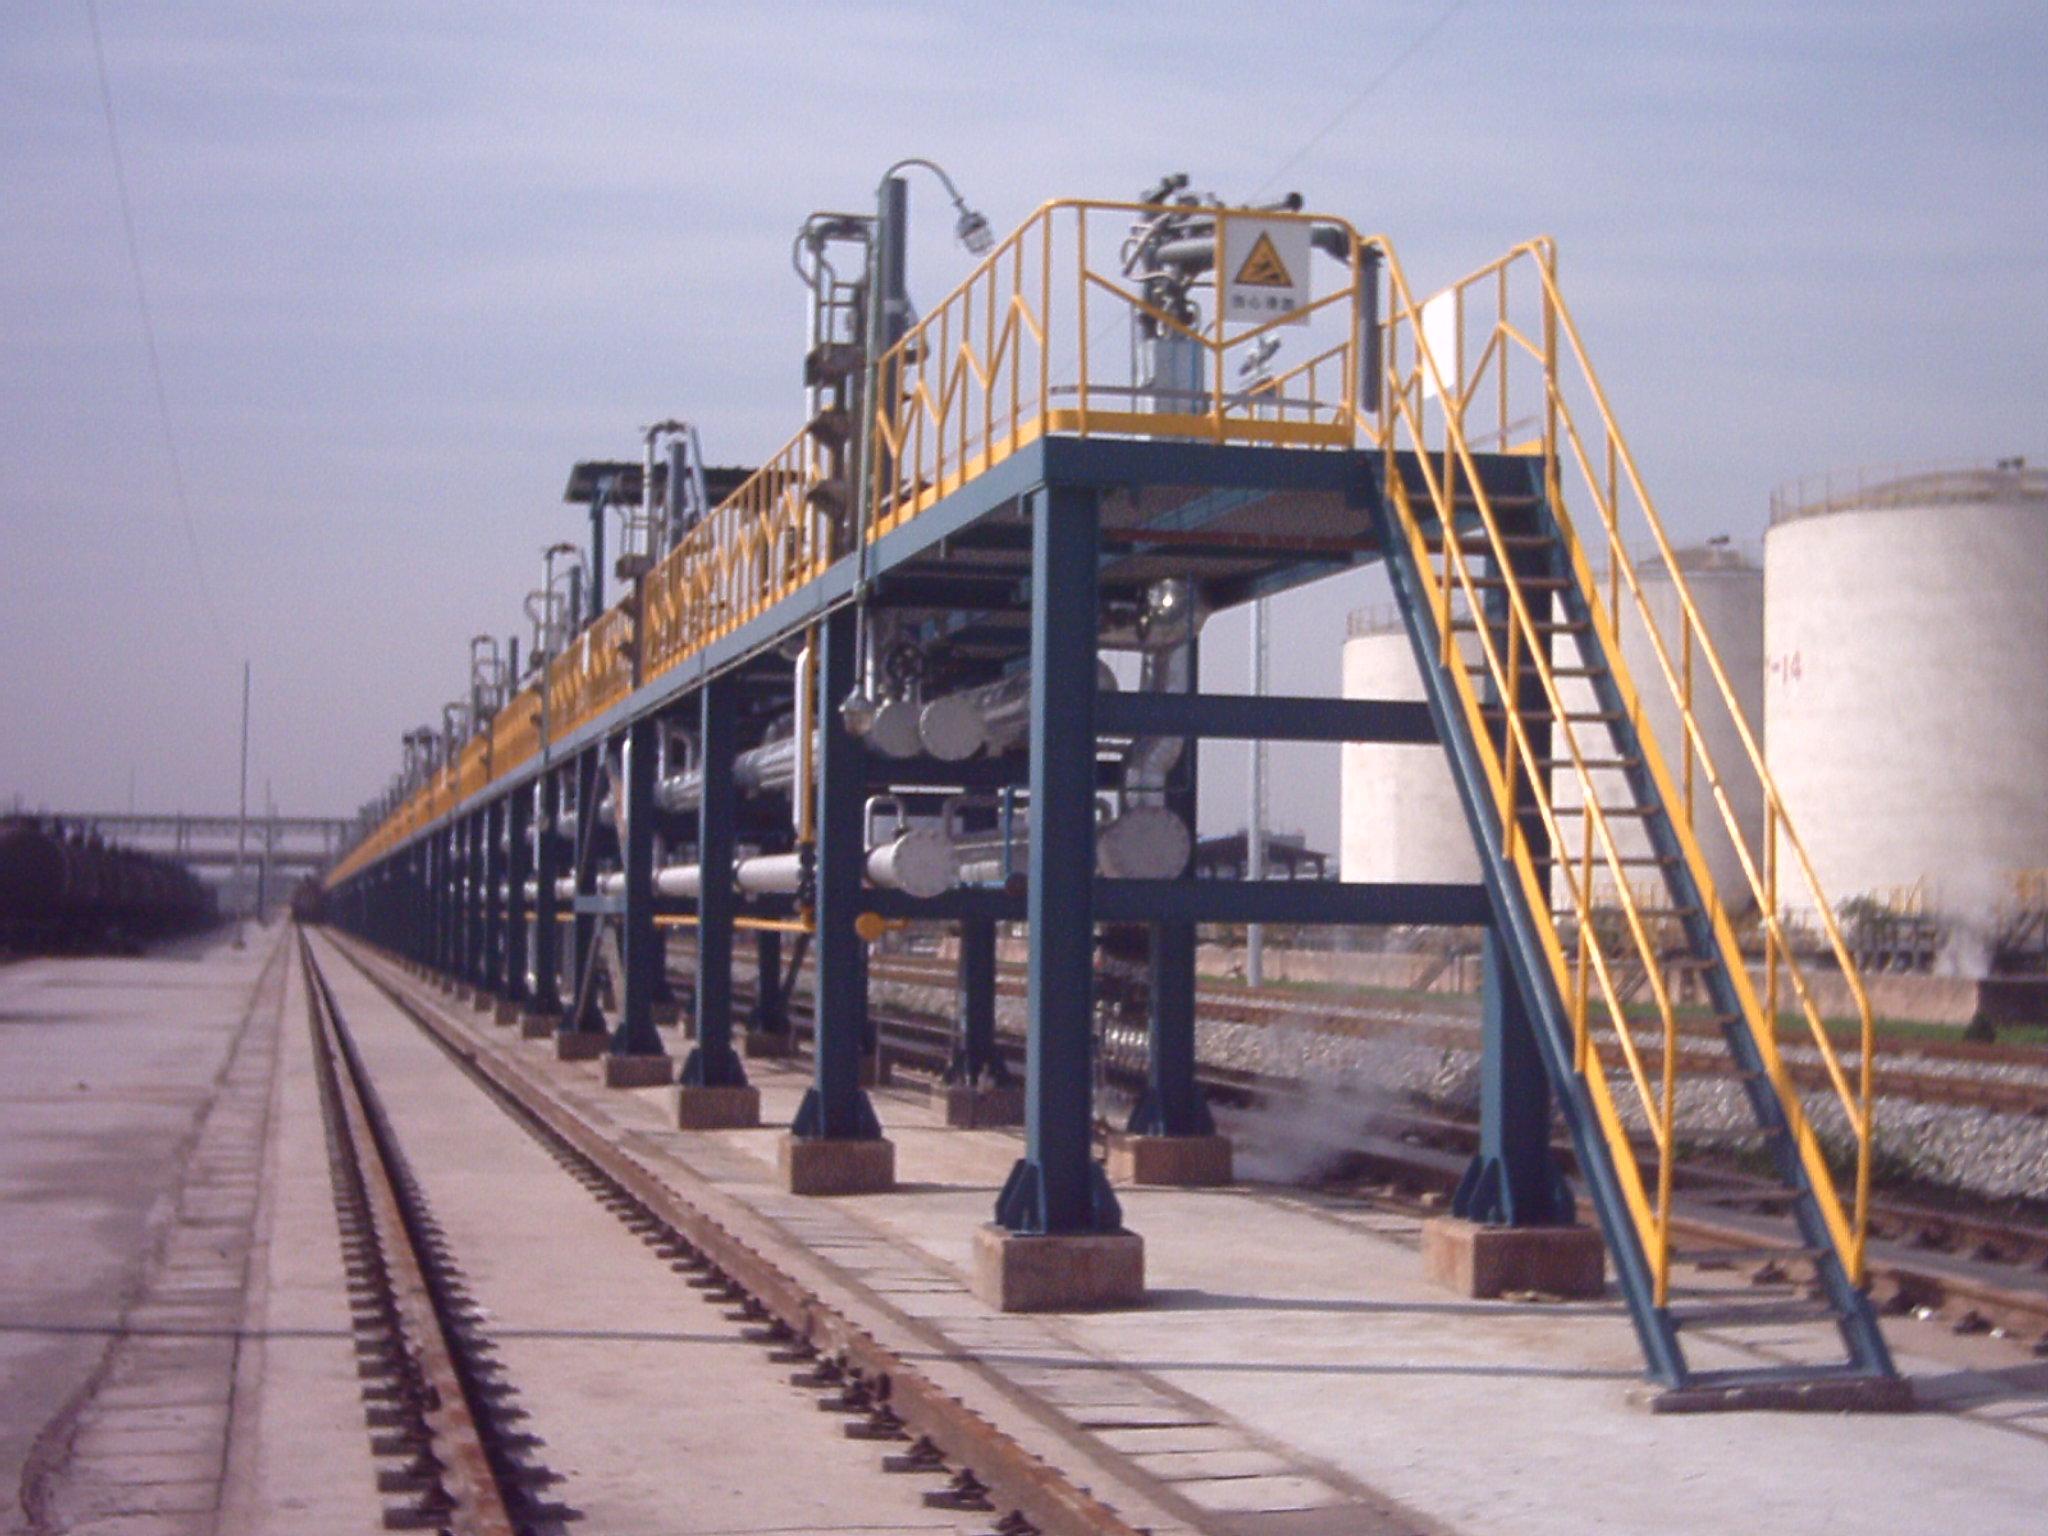 xi安石油hua工总厂